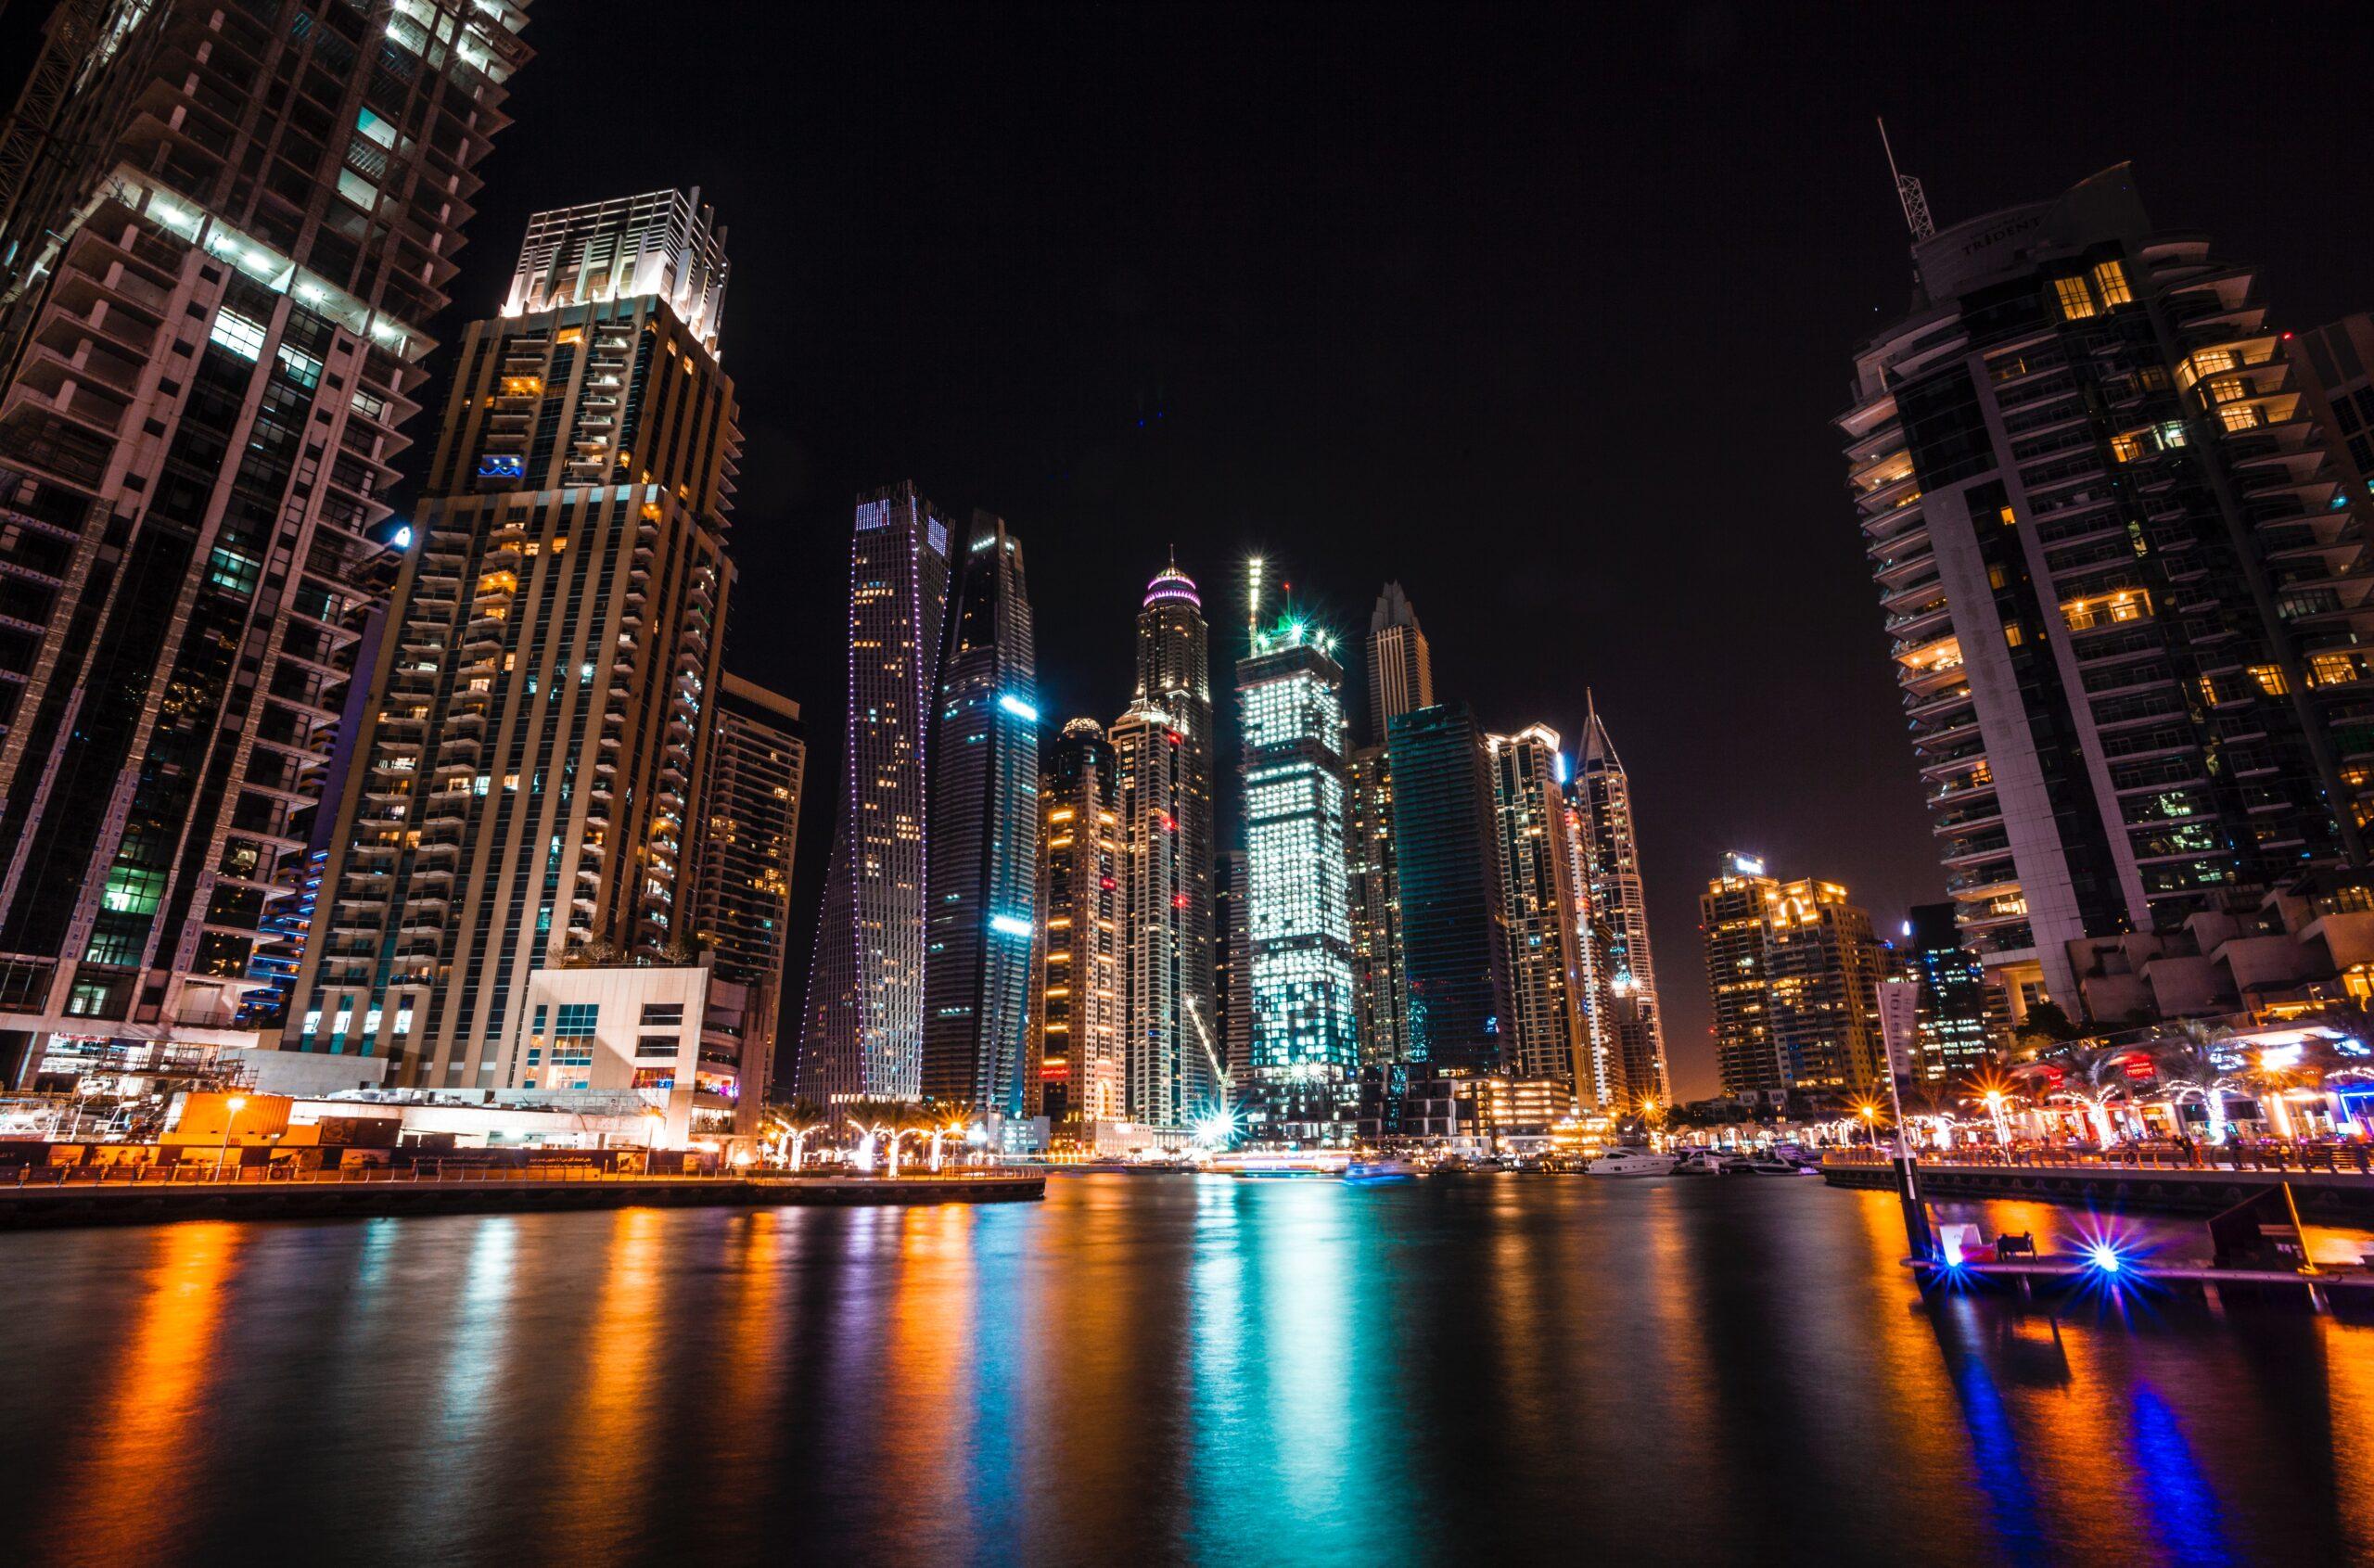 See Dubai At Night On Our Dubai Night Tour & Dhow Cruise Dinner